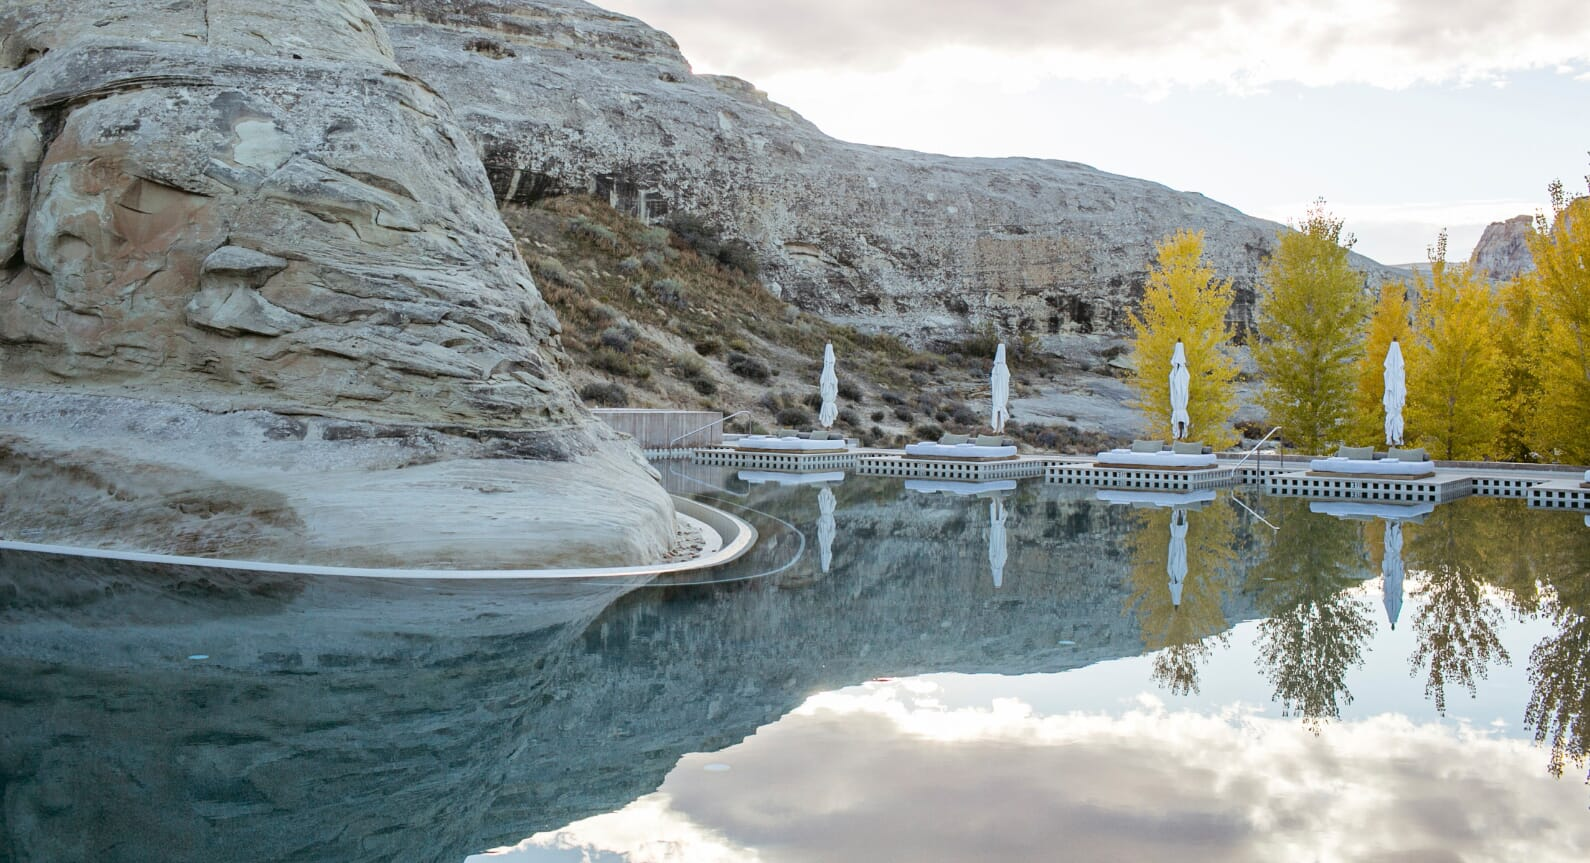 Is The Amangiri Resort The World's Best Desert Hotel?